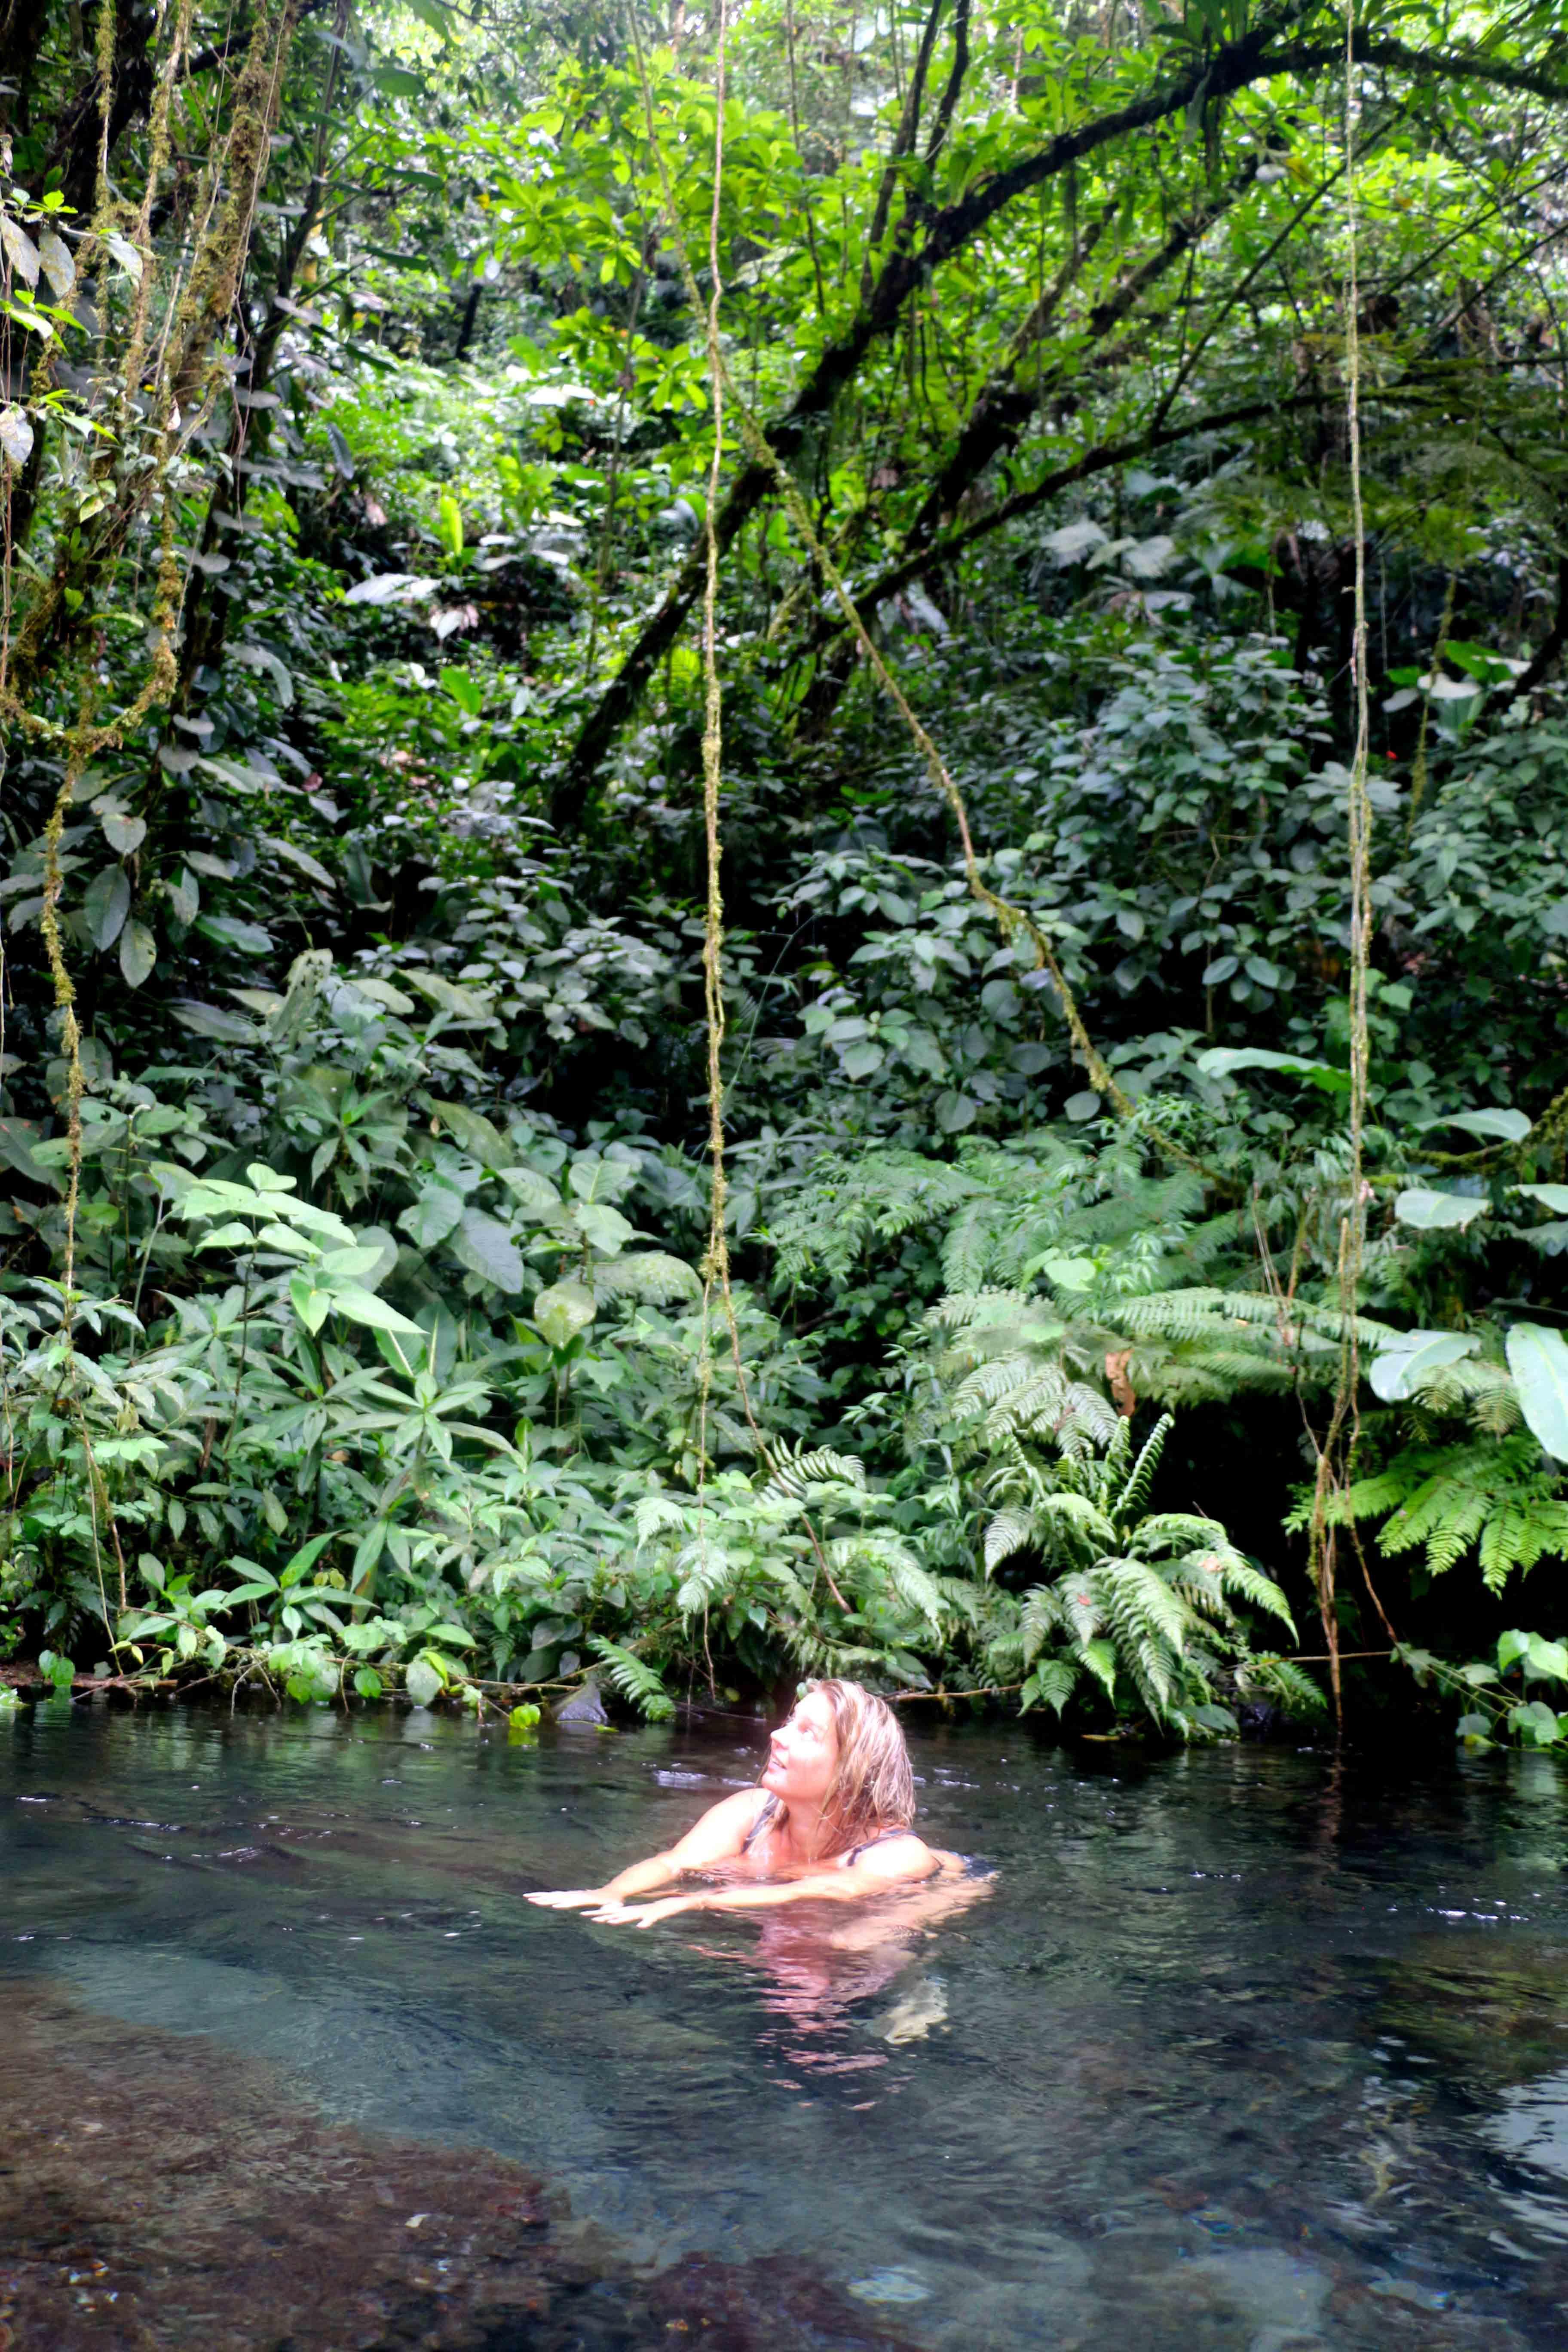 bo i regnskogen i costa rica